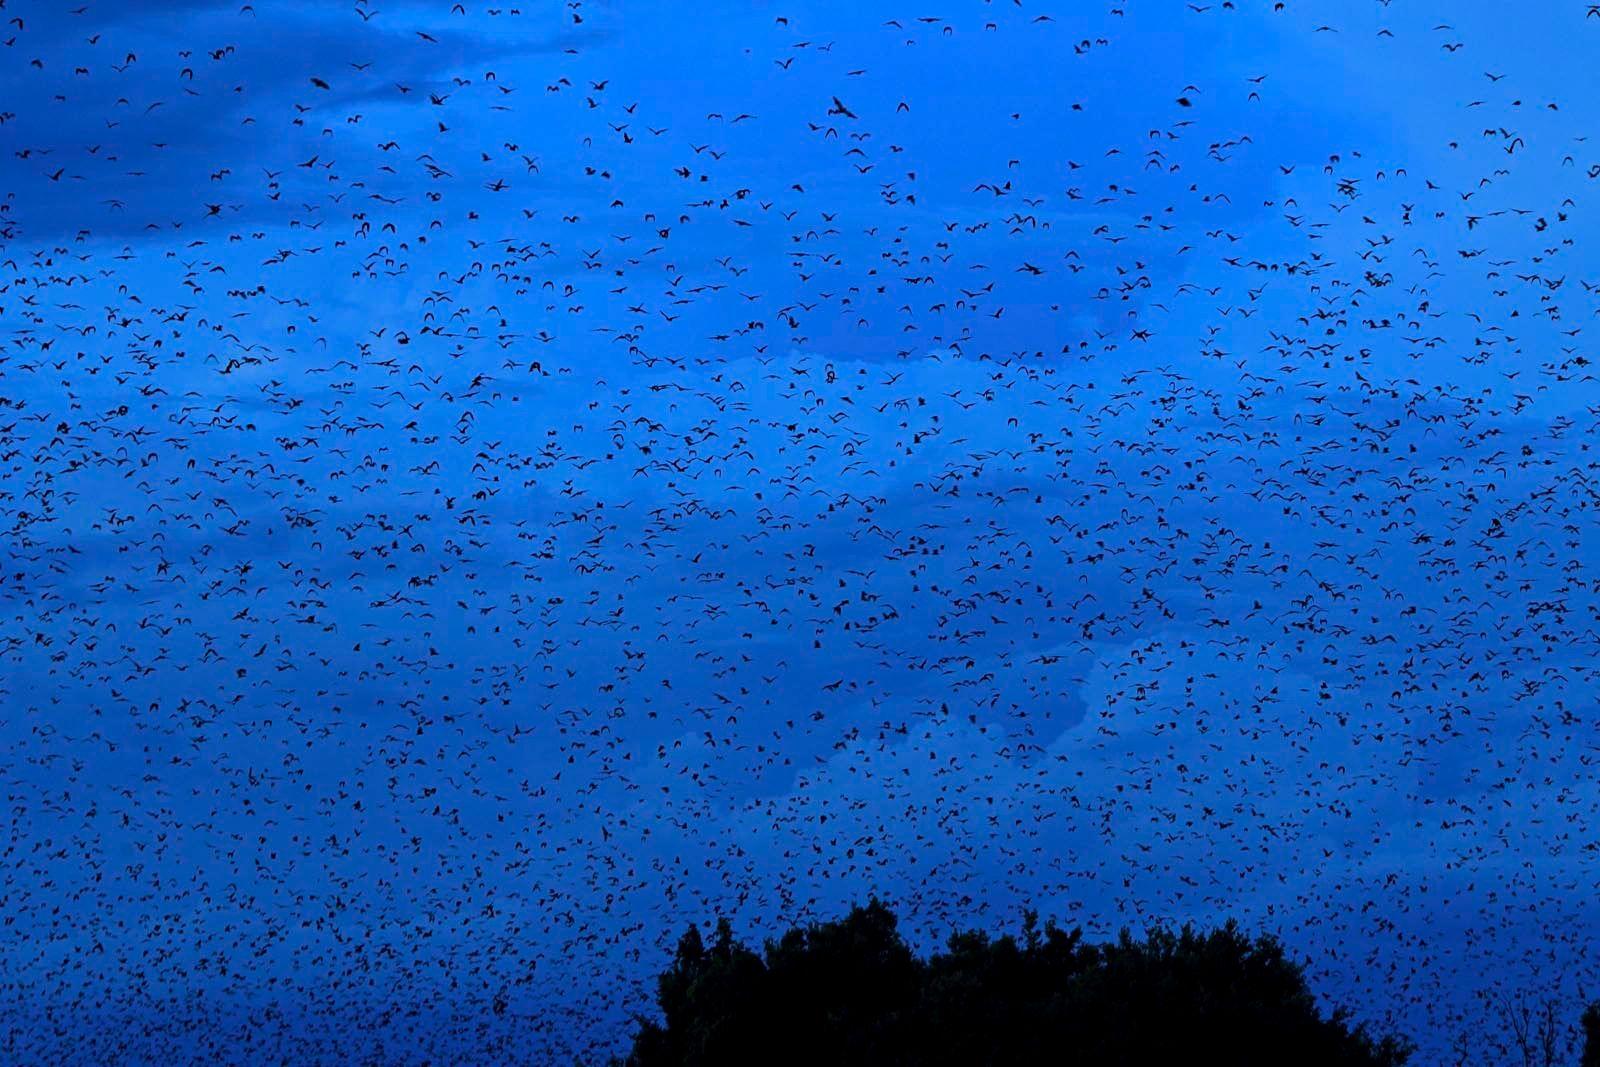 Tracking fruit bats